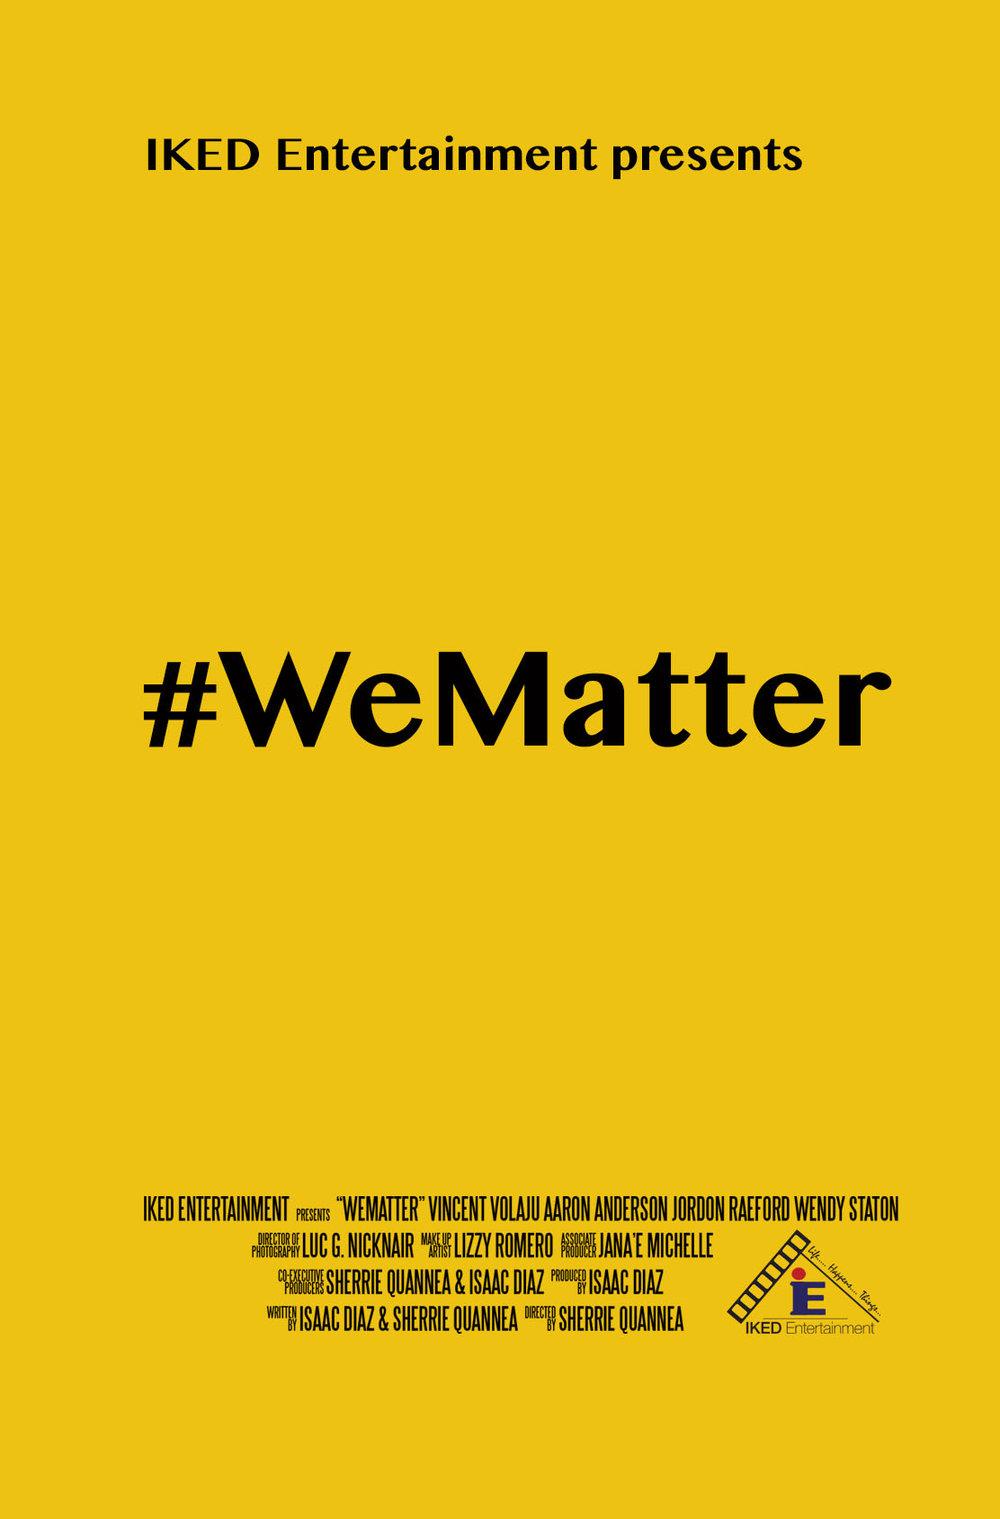 We Matter poster